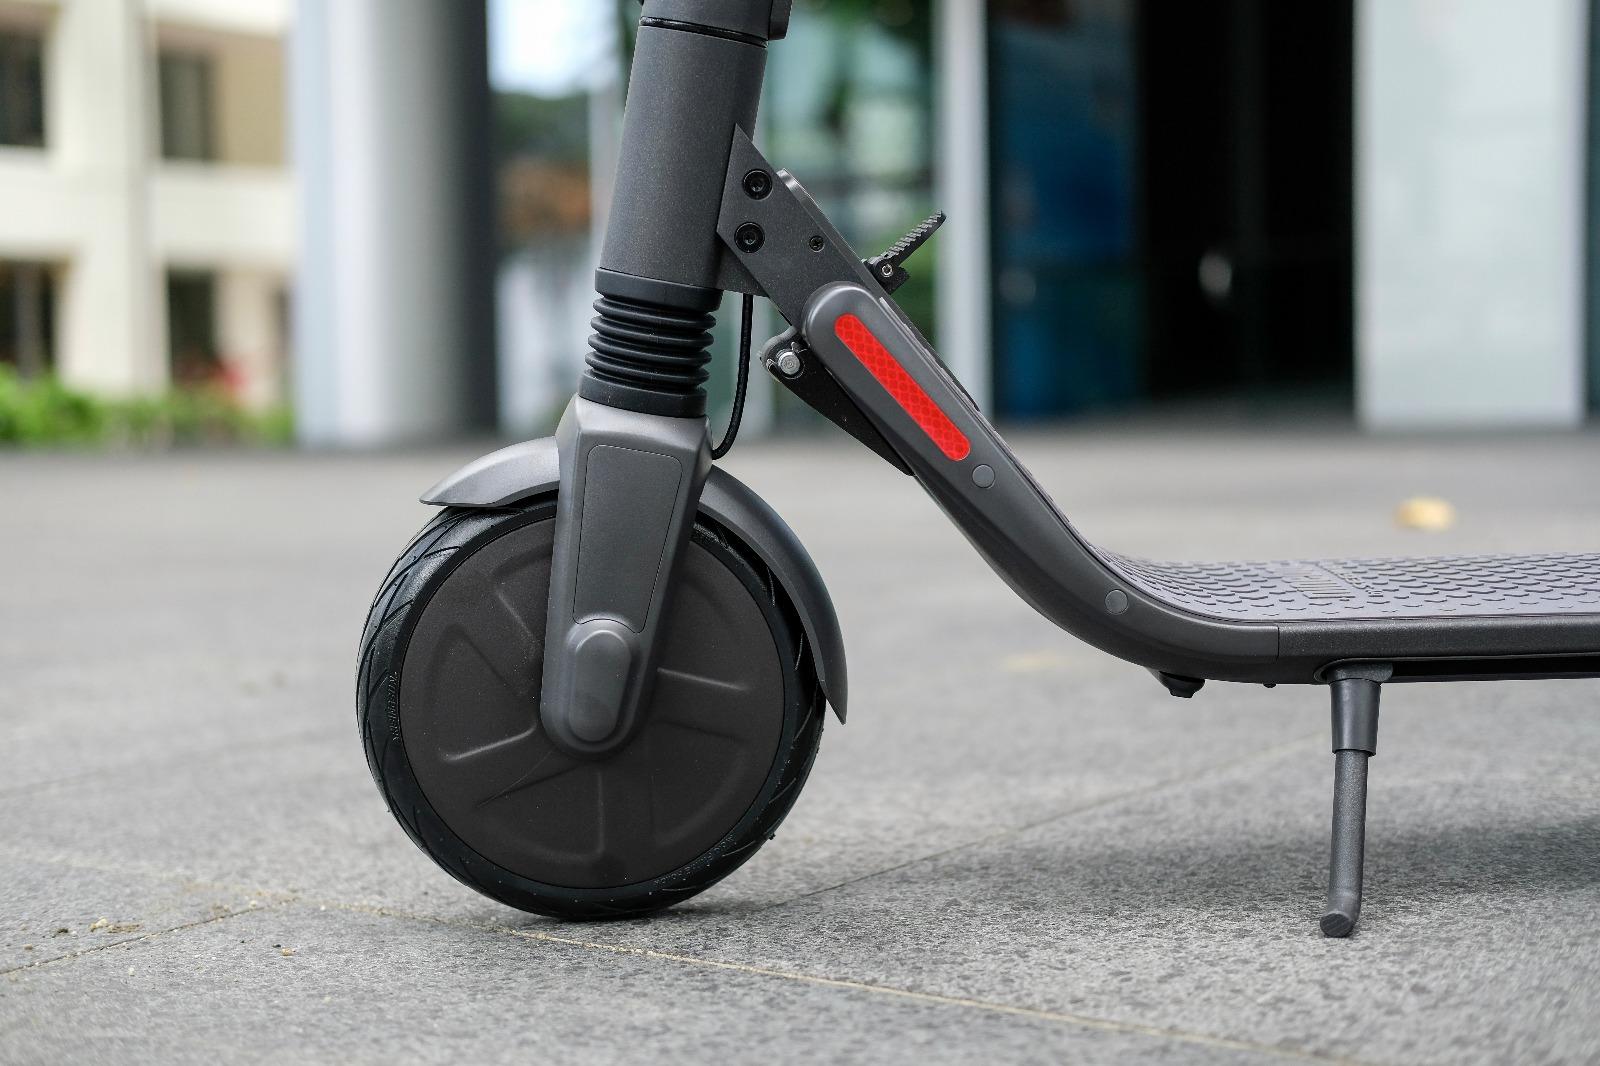 Beam escooter wheel